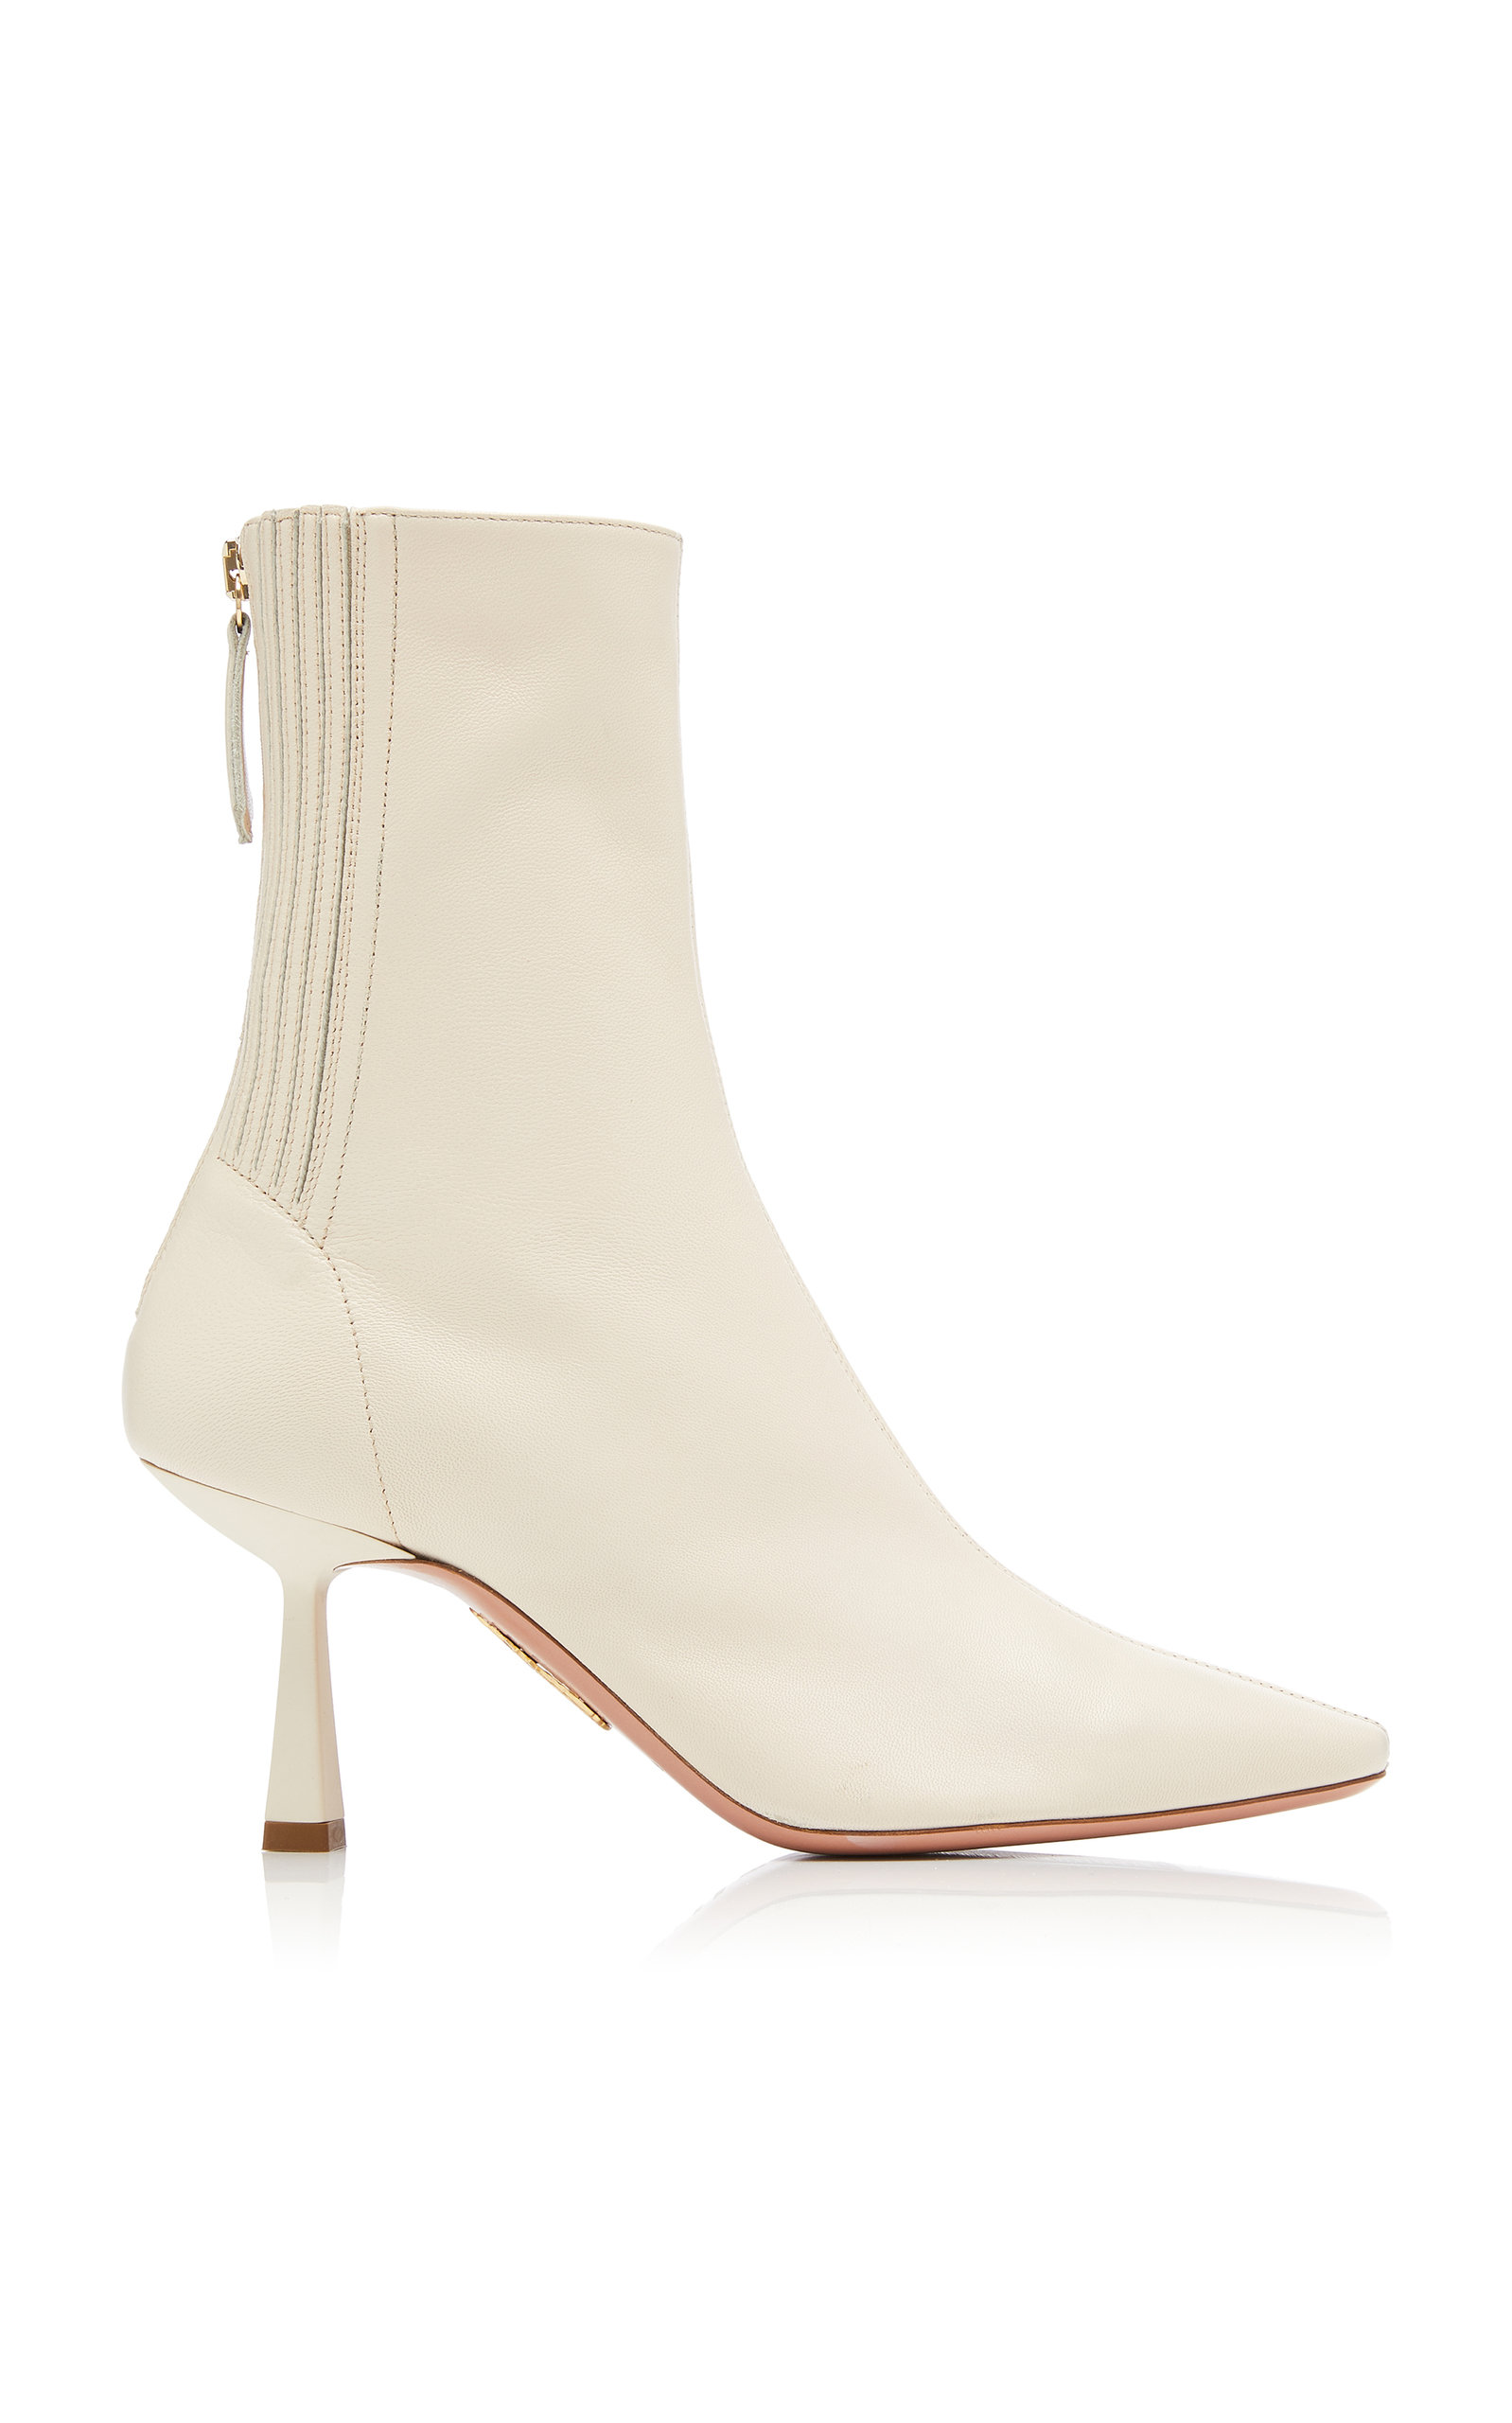 Aquazzura Boots Curzon Leather Ankle Boots